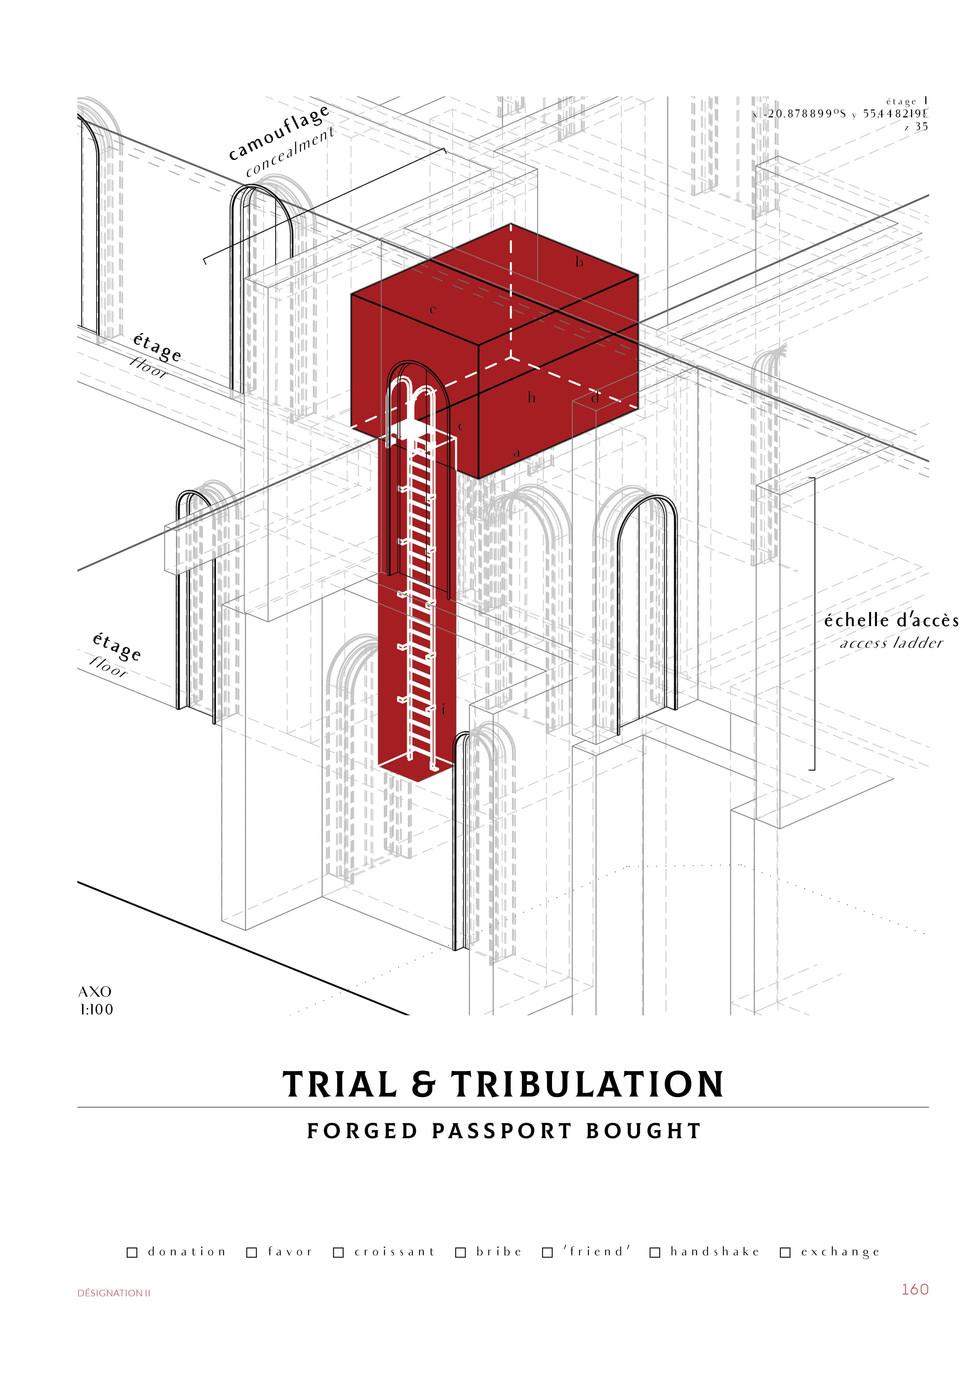 Trial and Tribulation (Almanac IV). Fischer, S. Unit 12. 2018